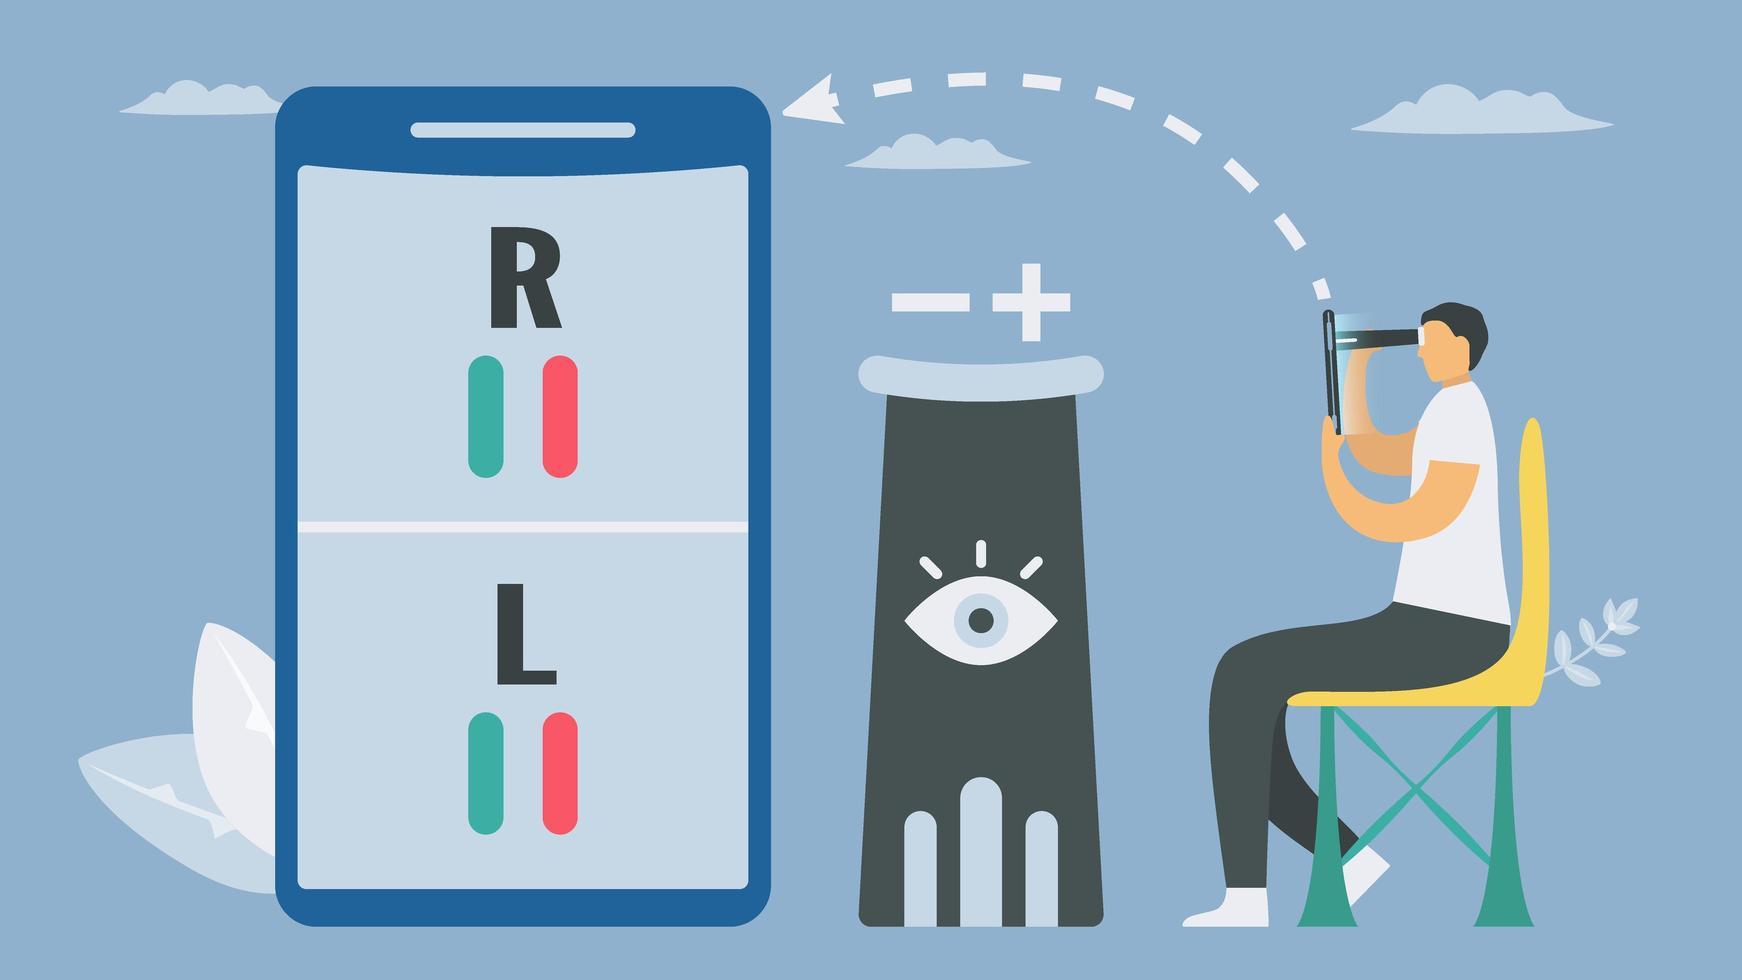 Gesundheitsanwendung Innovation Smartphone Vision Checking vektor